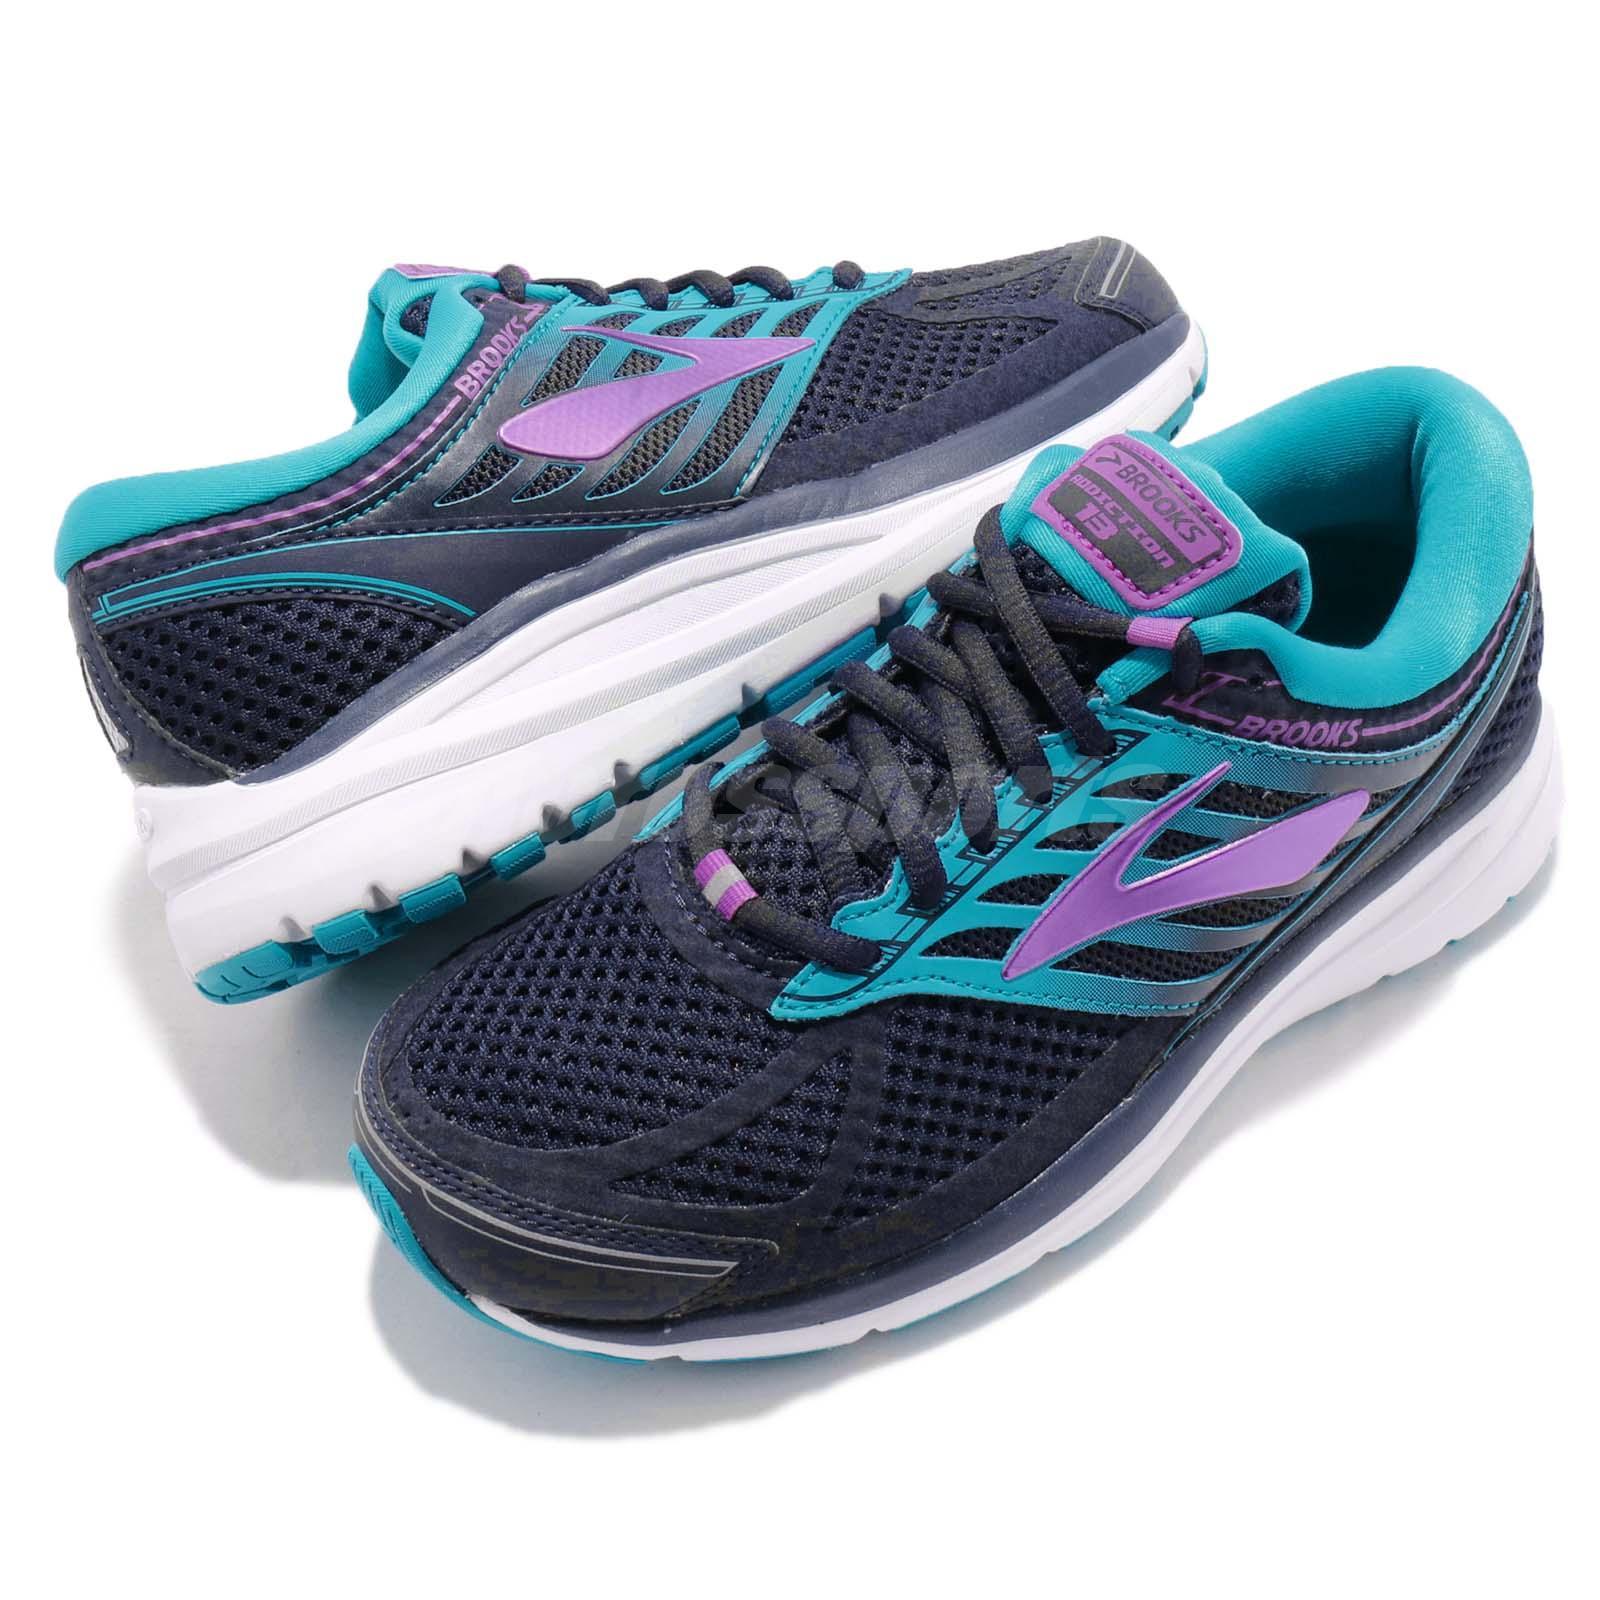 a6d336ce949 Details about Brooks Addiction 13 2E Extra Wide Blue Navy Purple Women  Running Shoes 120253 2E